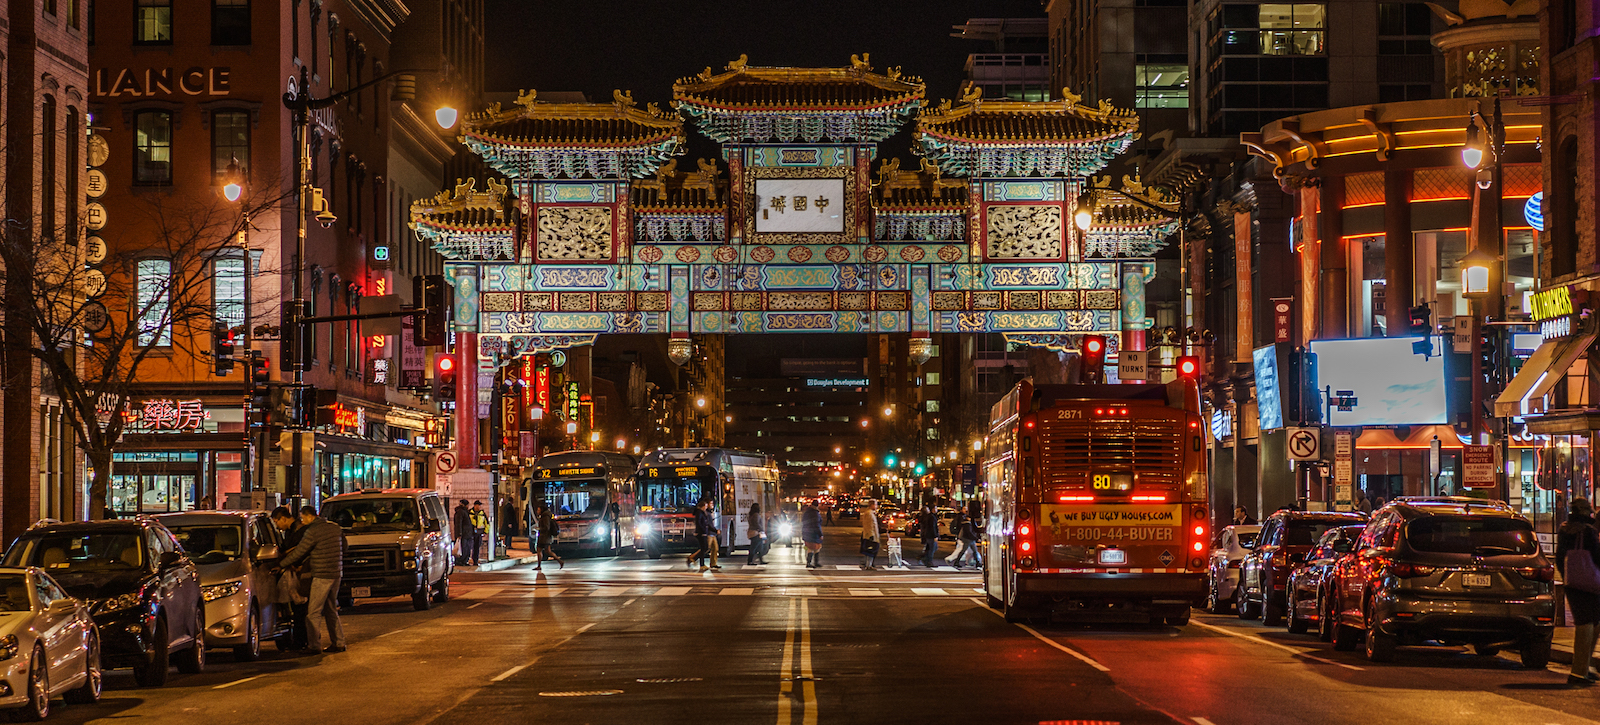 Chinatown, Washington (Photo: Soomness/Flickr)